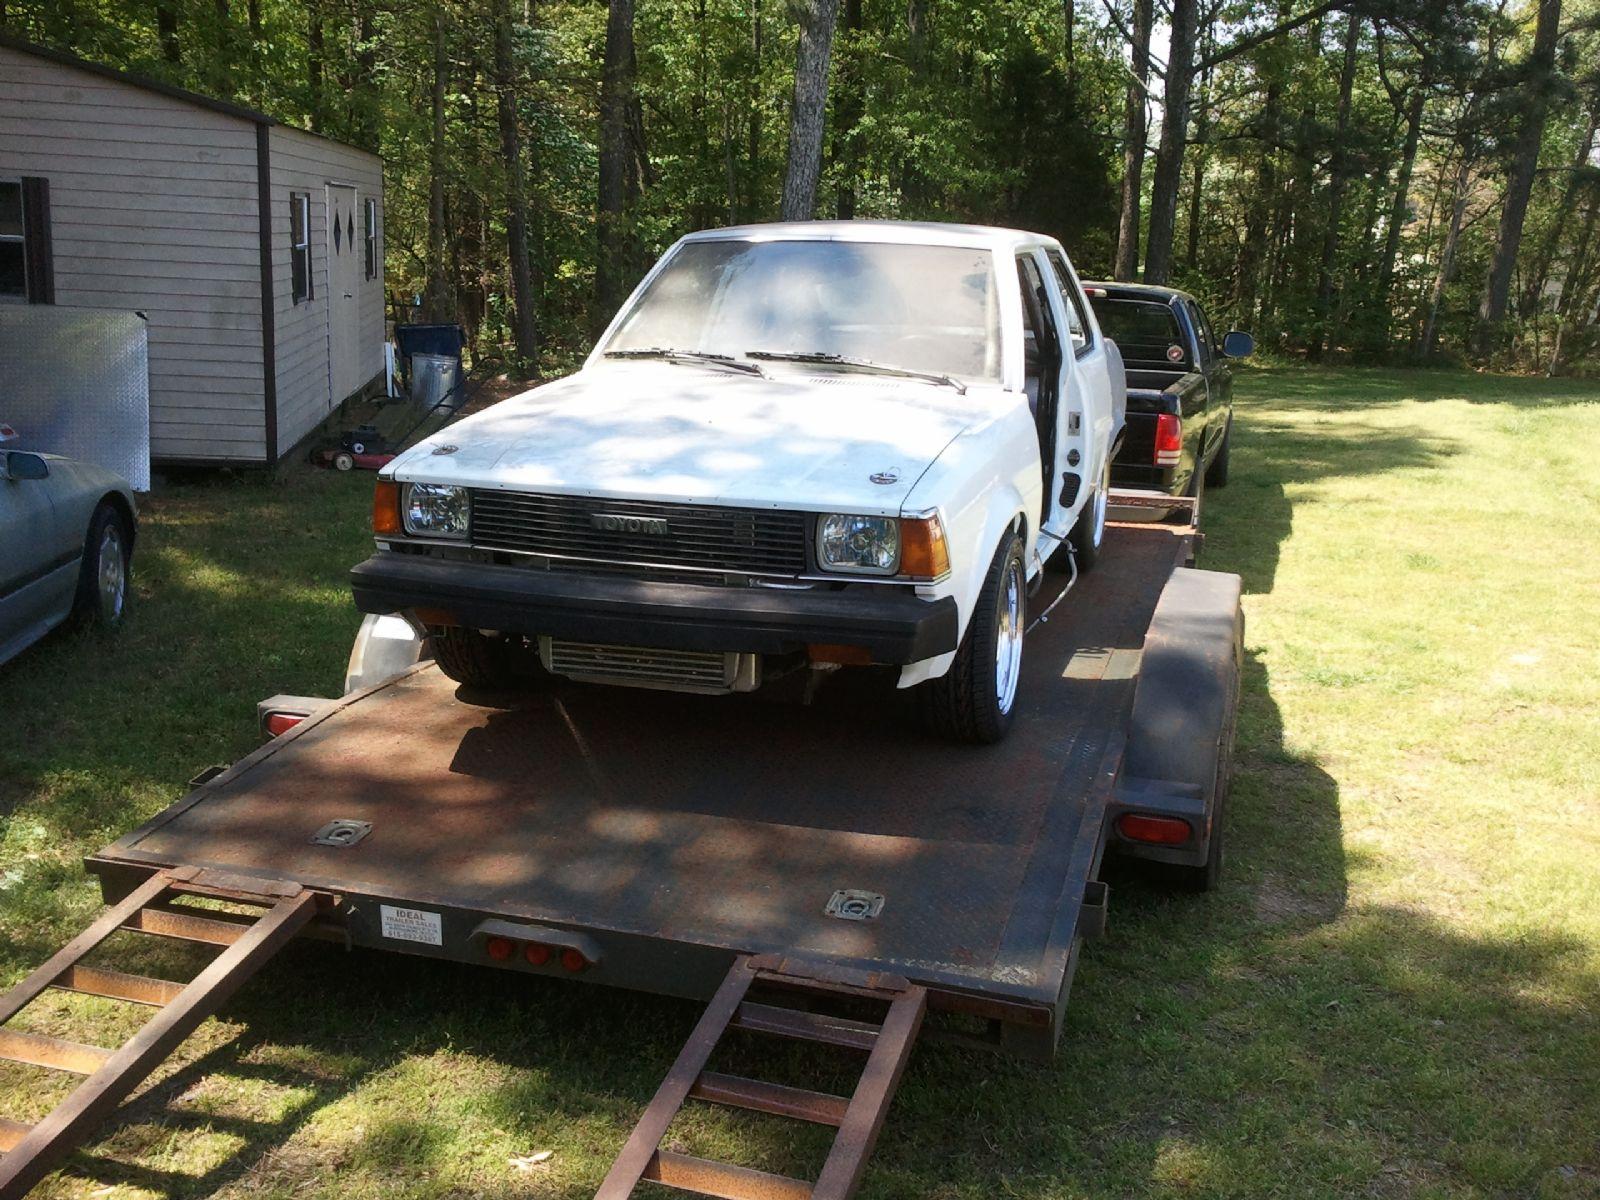 1983 Toyota ke70 [Corolla] 1jz corolla/ turbo For Sale